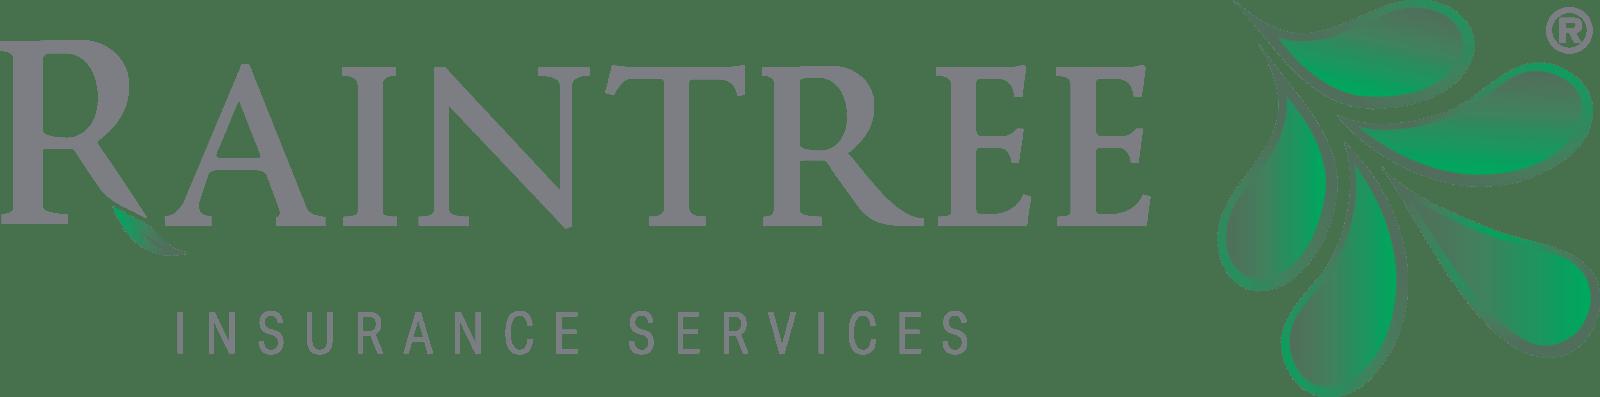 Raintree Insurance Services